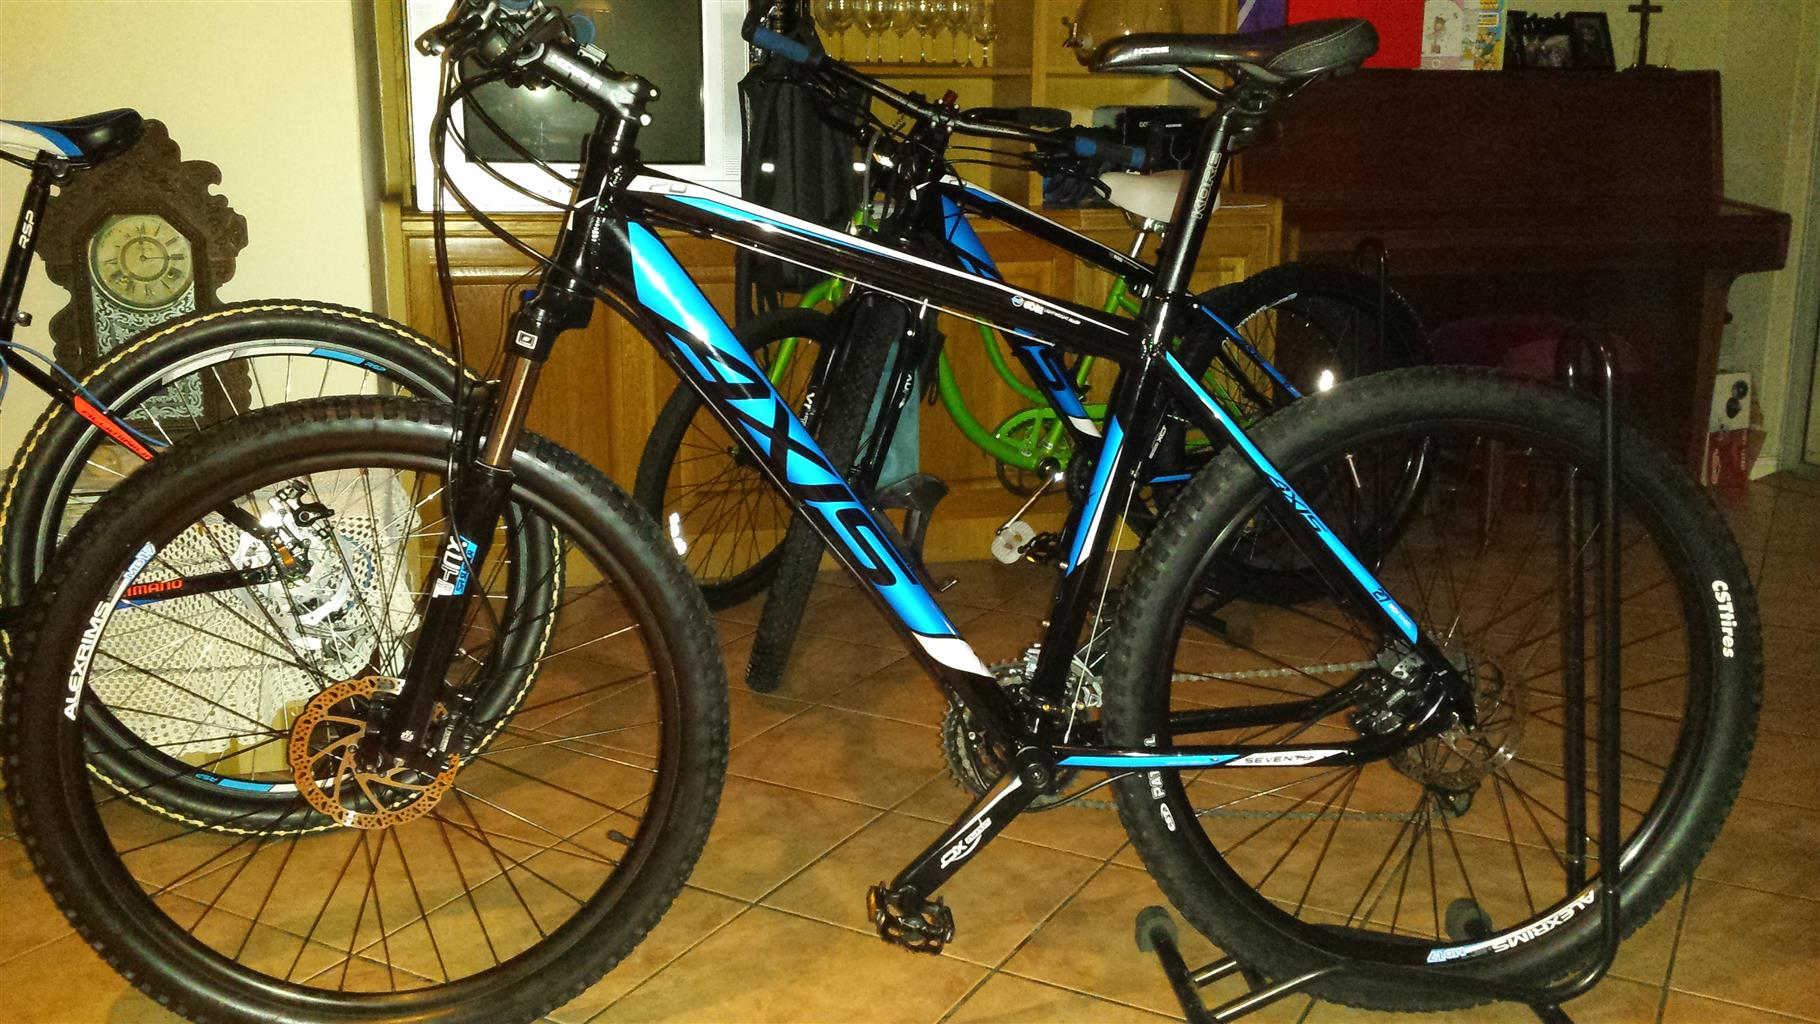 axis A 70 650b 27.5 mountain bike for sale